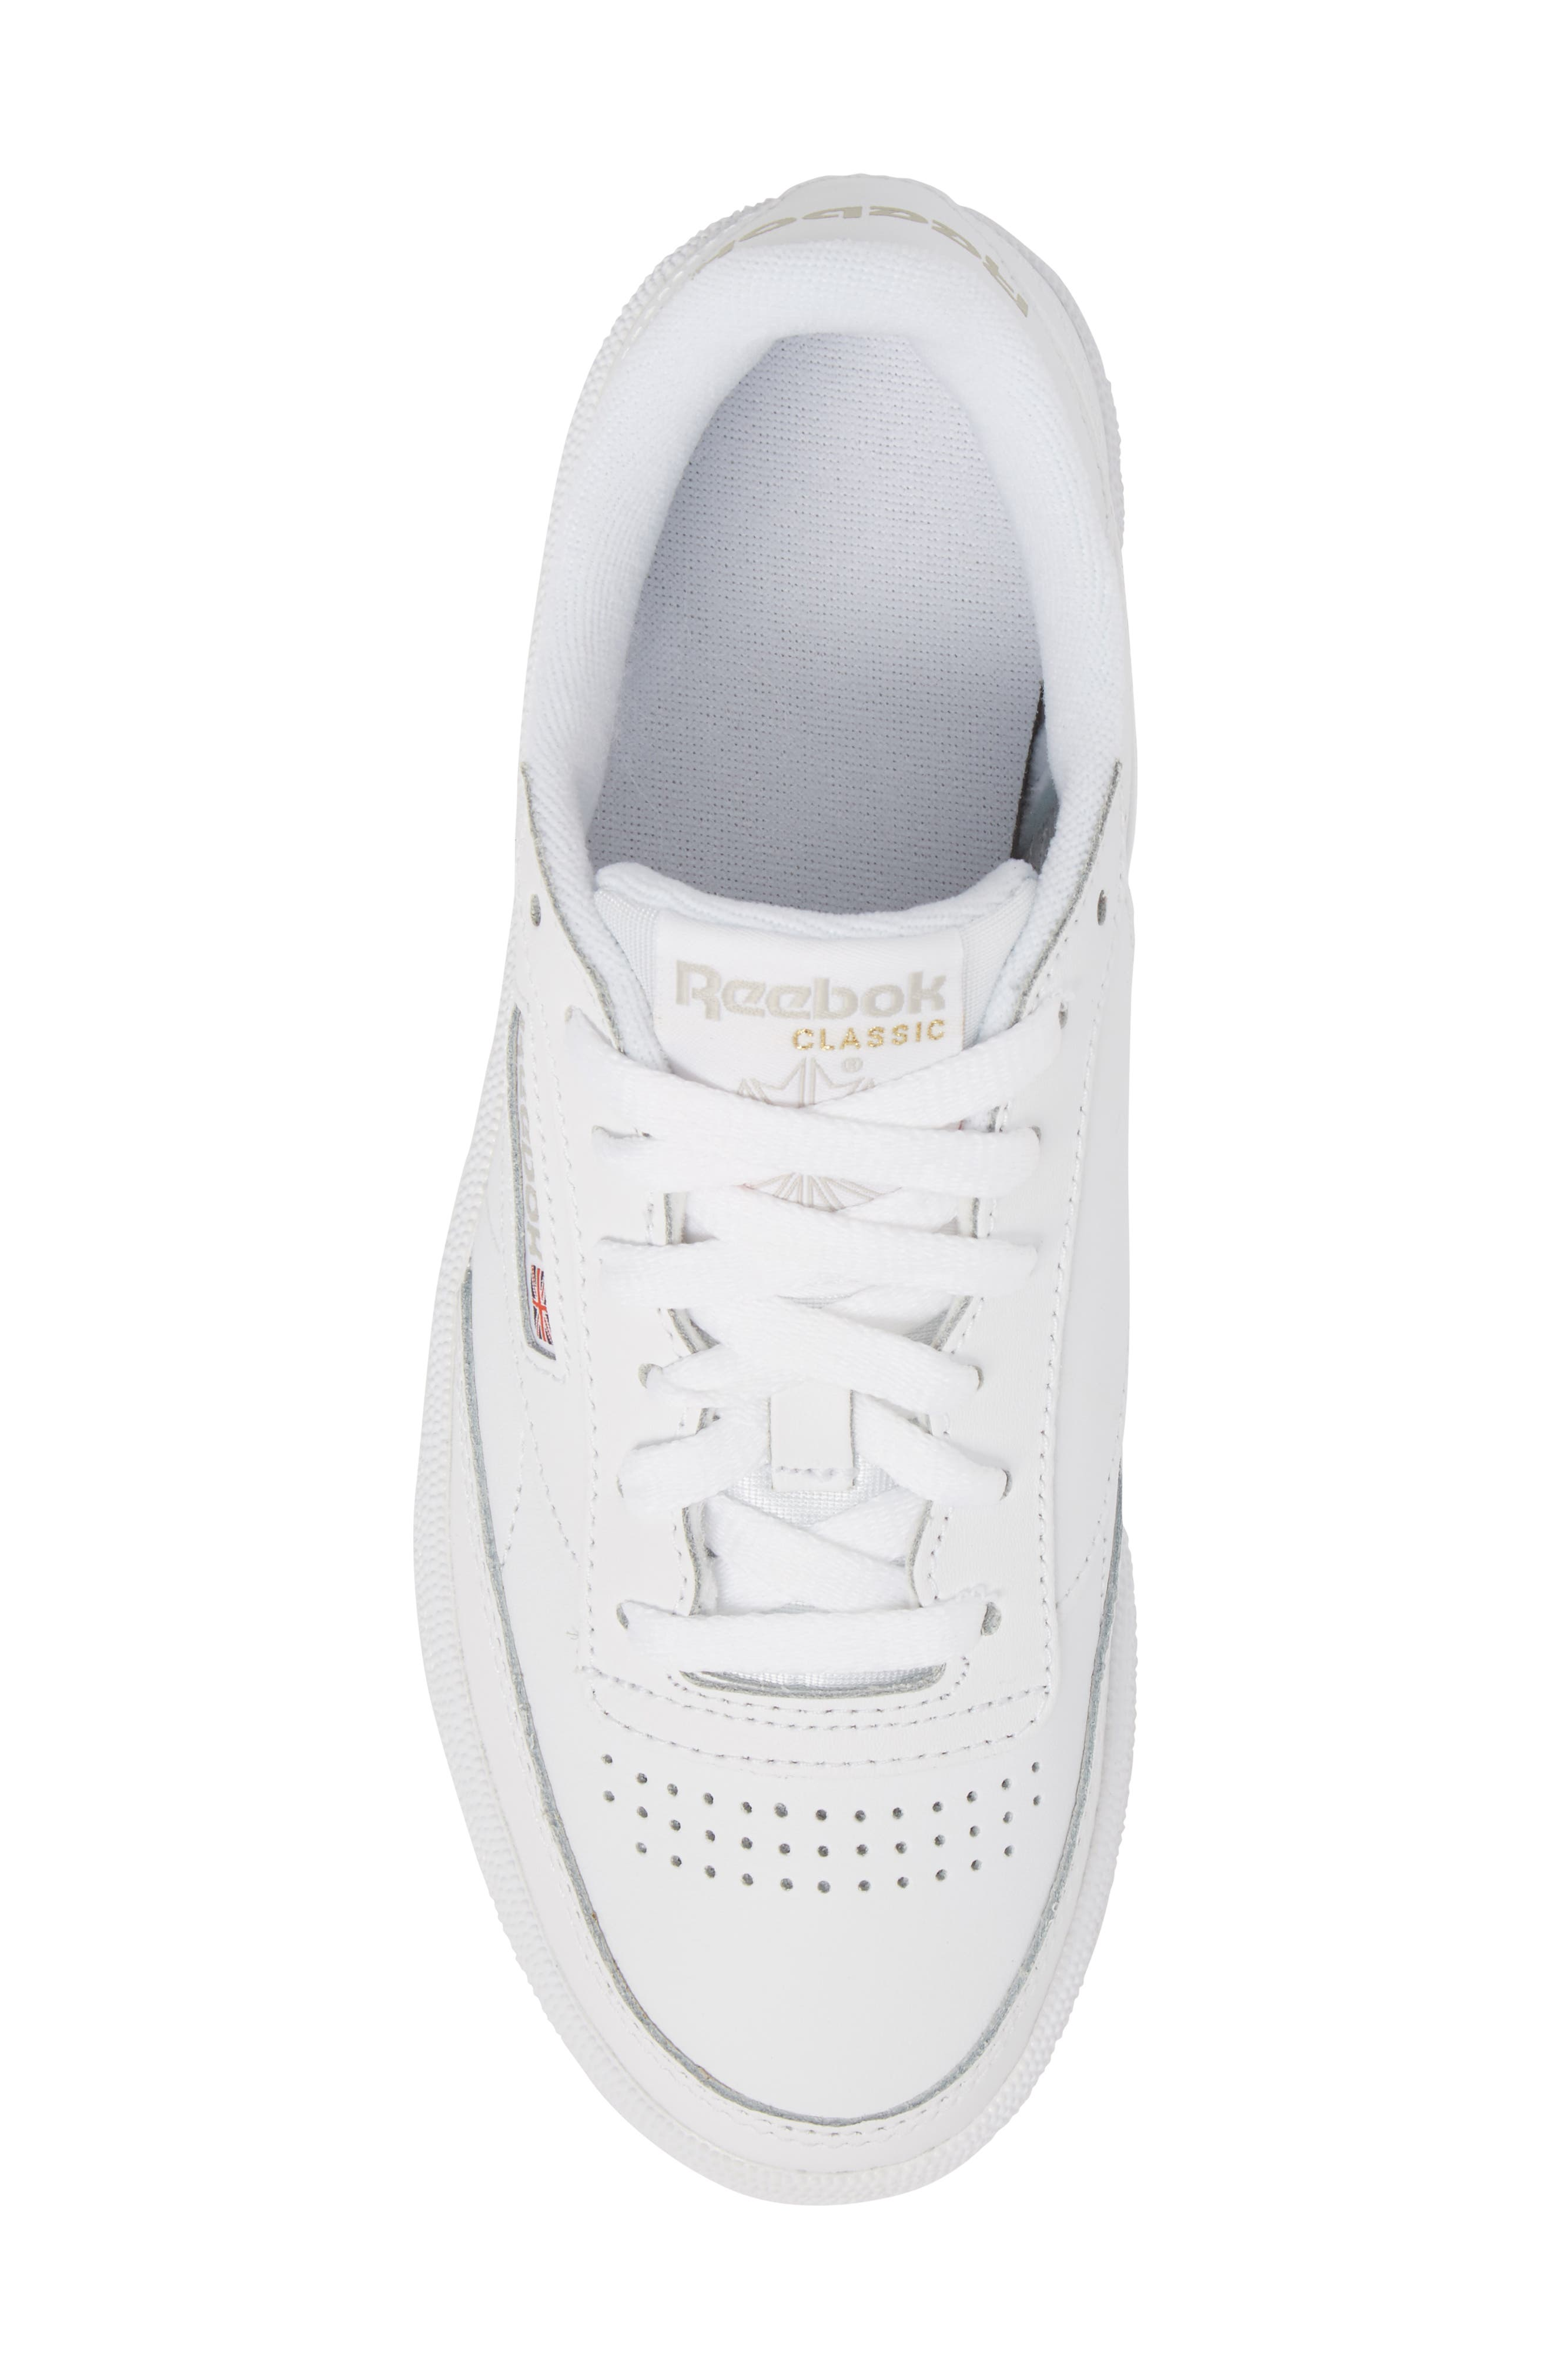 REEBOK, Club C 85 Sneaker, Alternate thumbnail 5, color, WHITE/ LIGHT GREY/ GUM